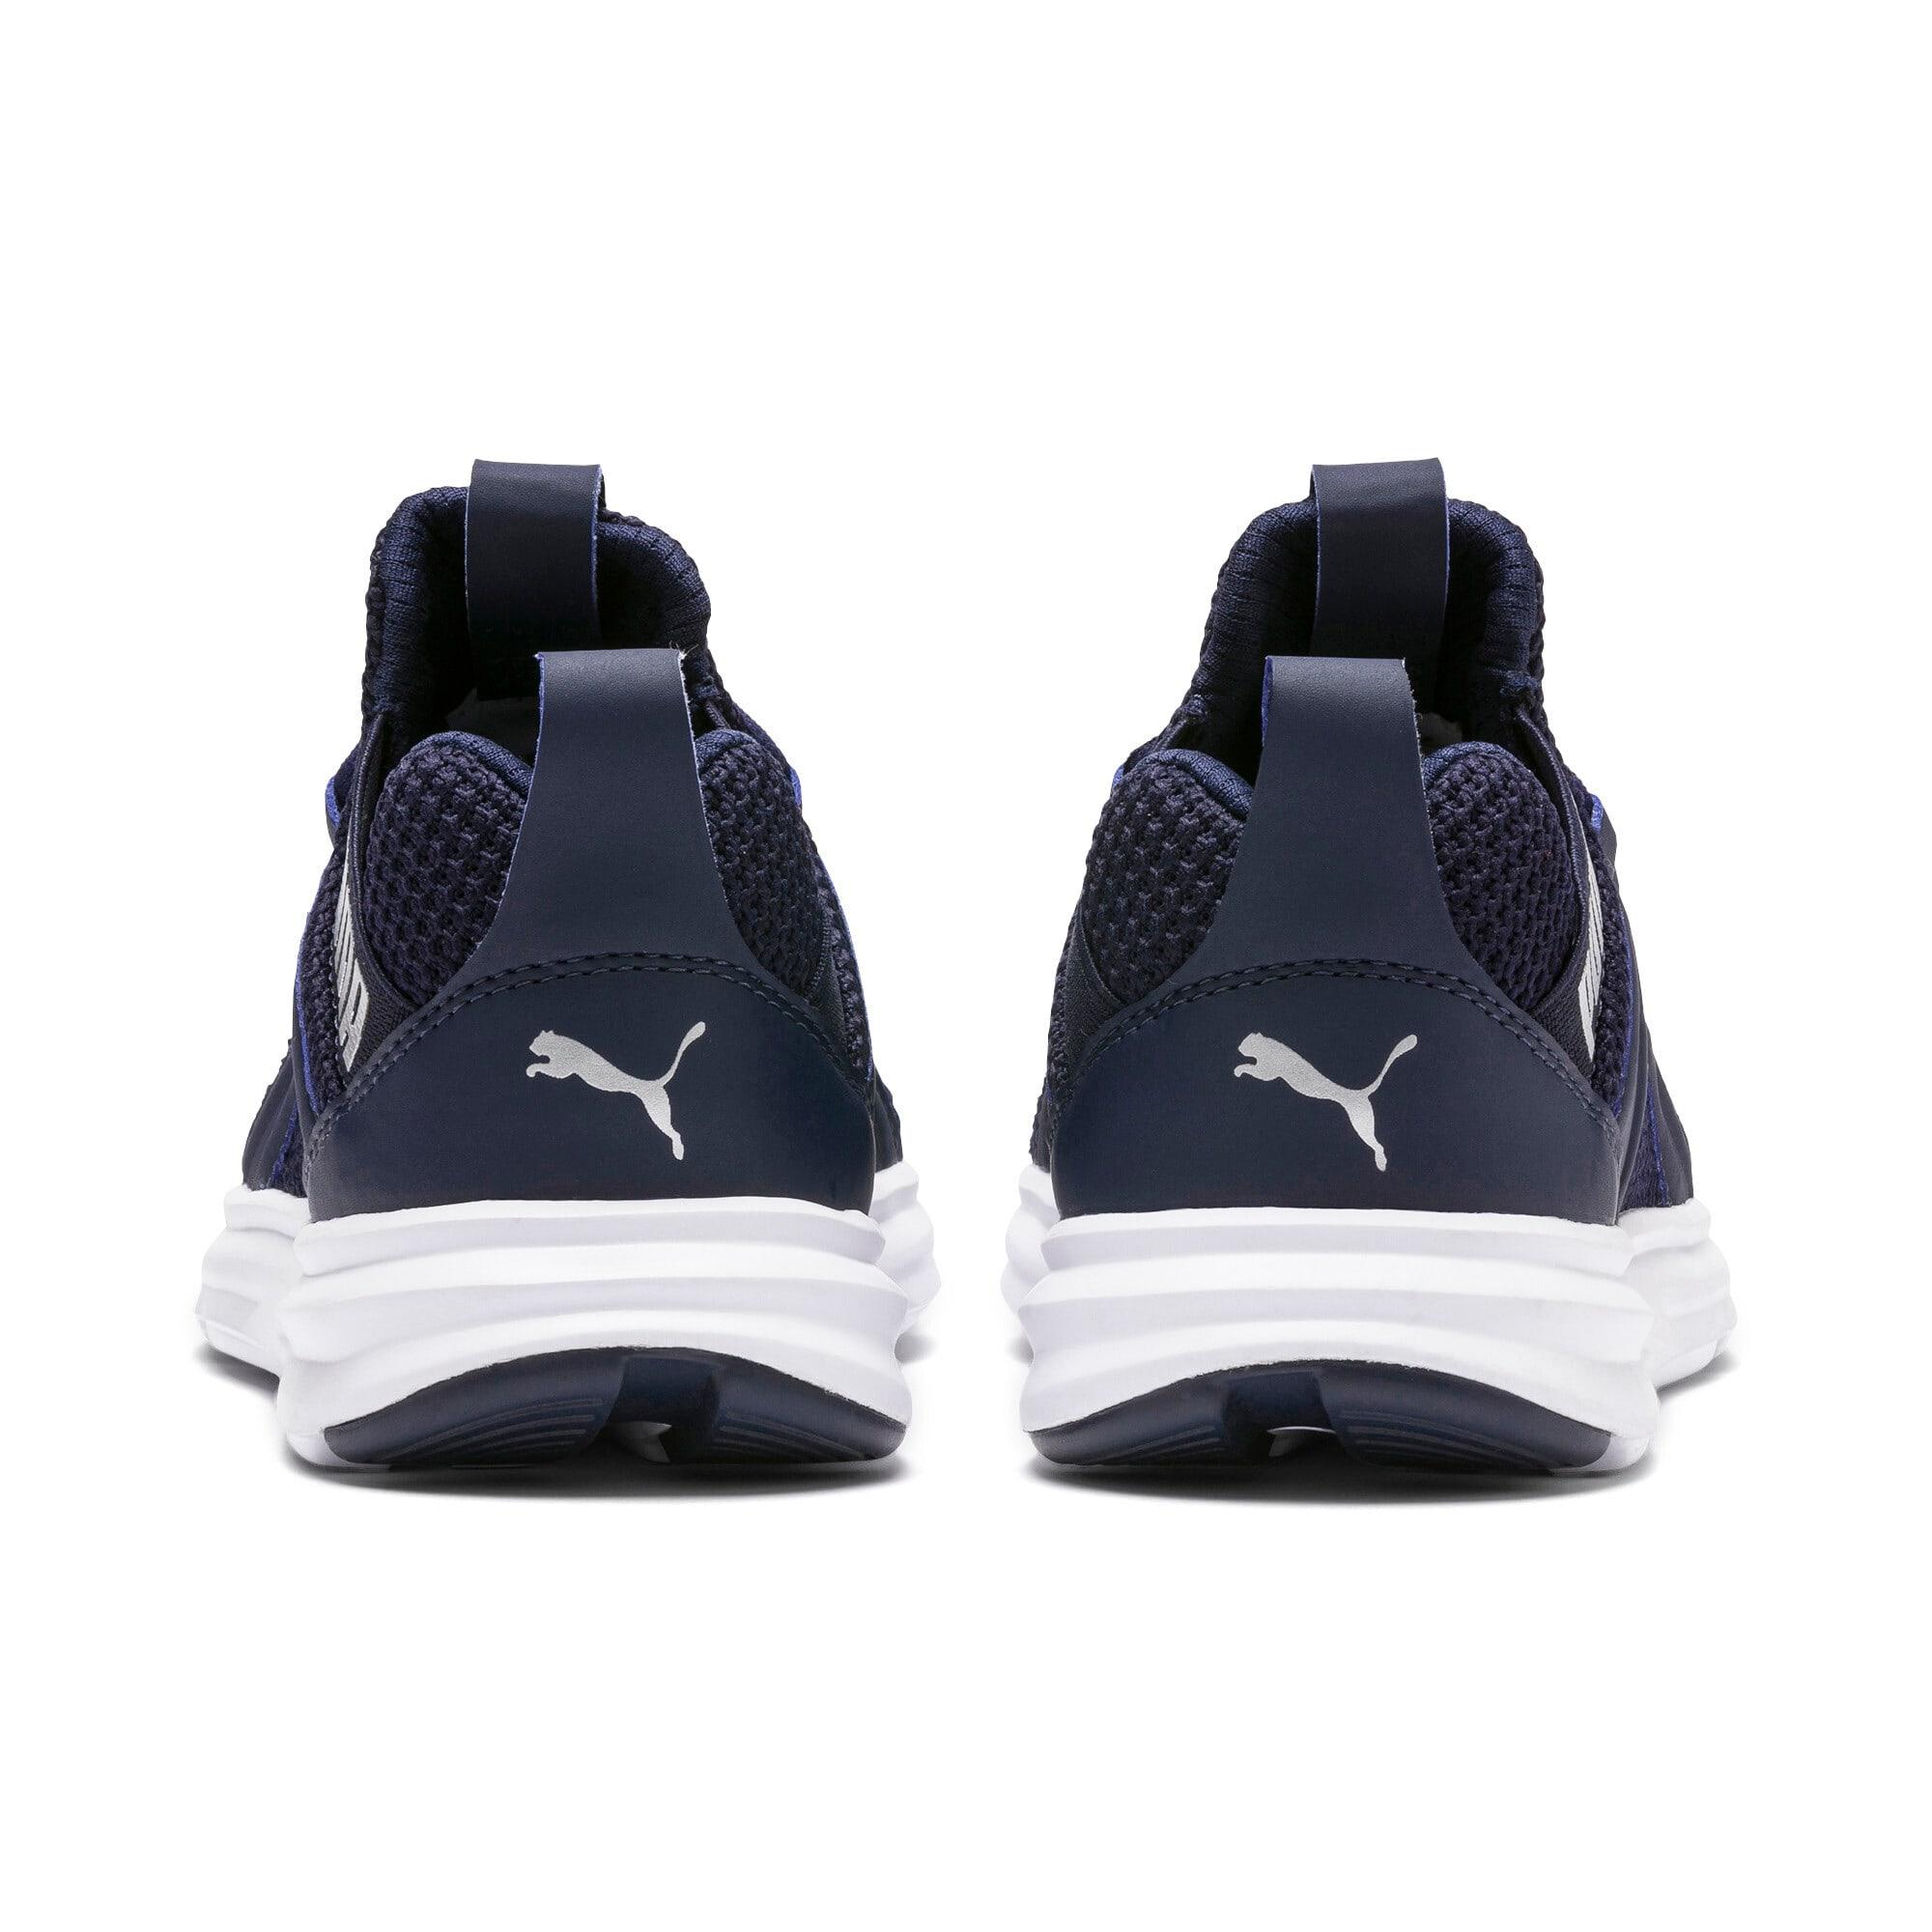 Thumbnail 4 of Enzo Weave AC Sneakers PS, Peacoat - Silver-Puma White, medium